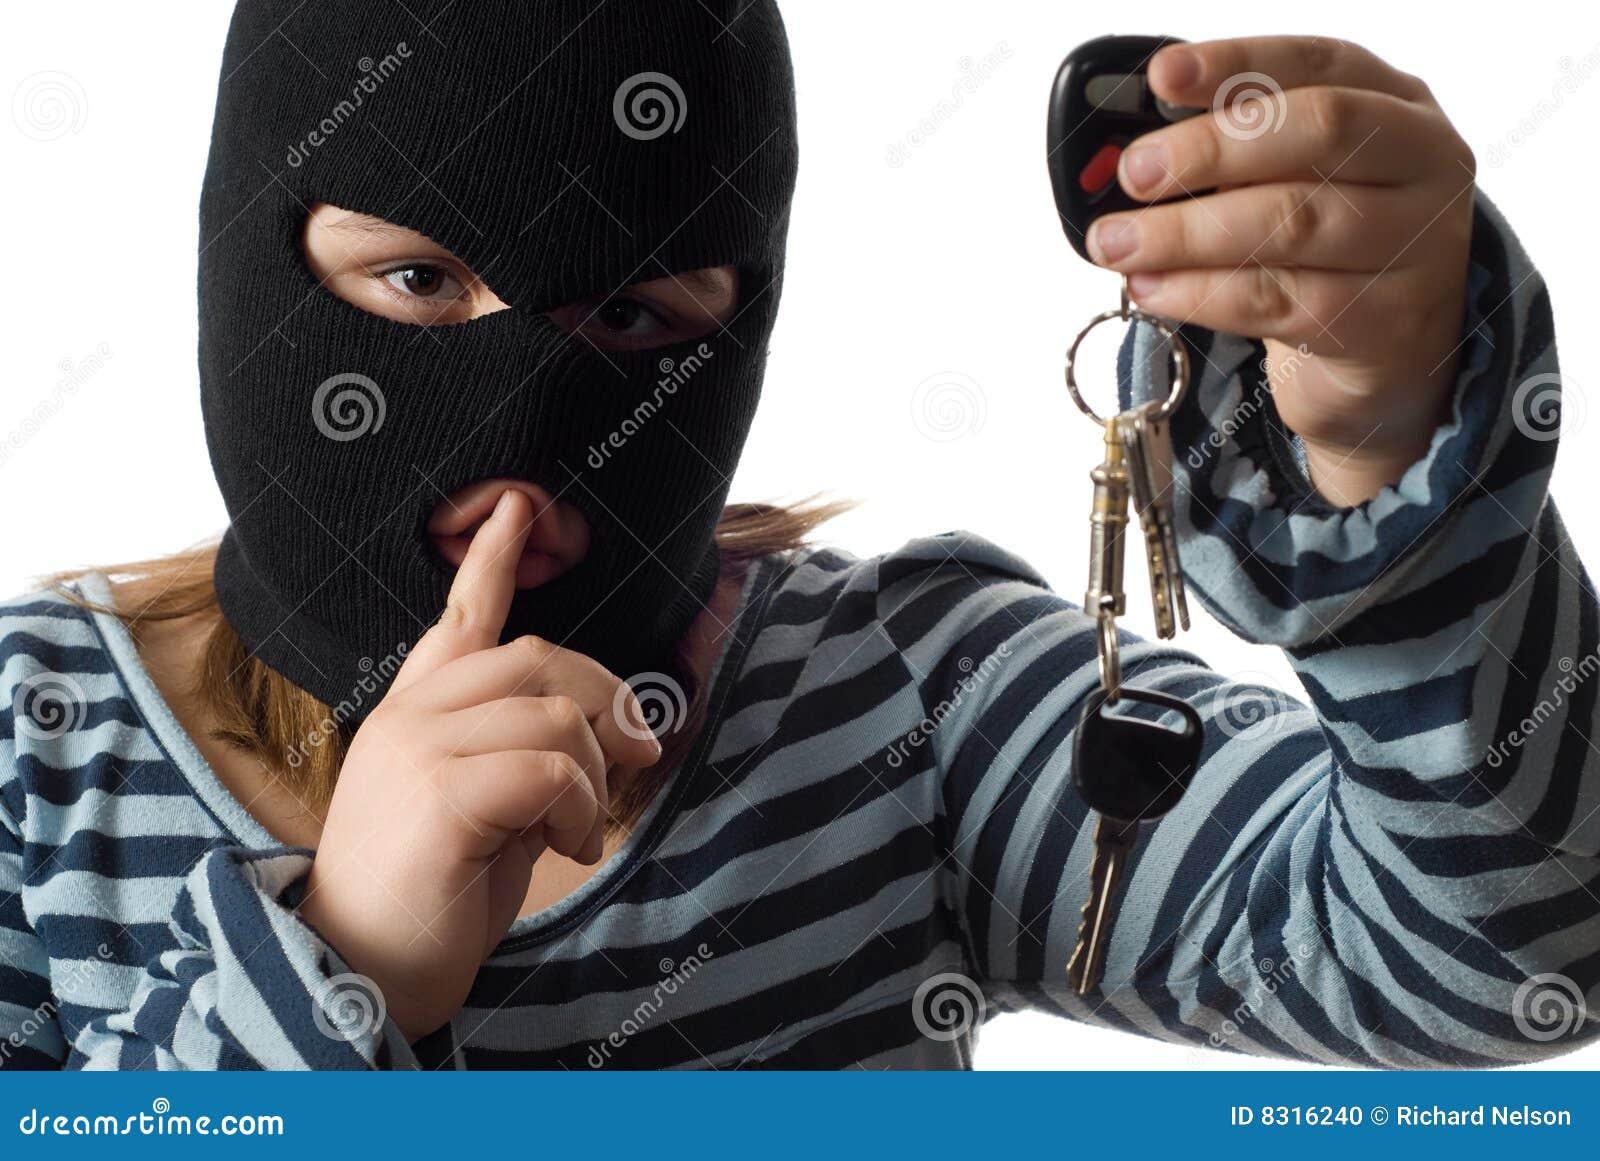 child-stealing-car-keys-8316240.jpg